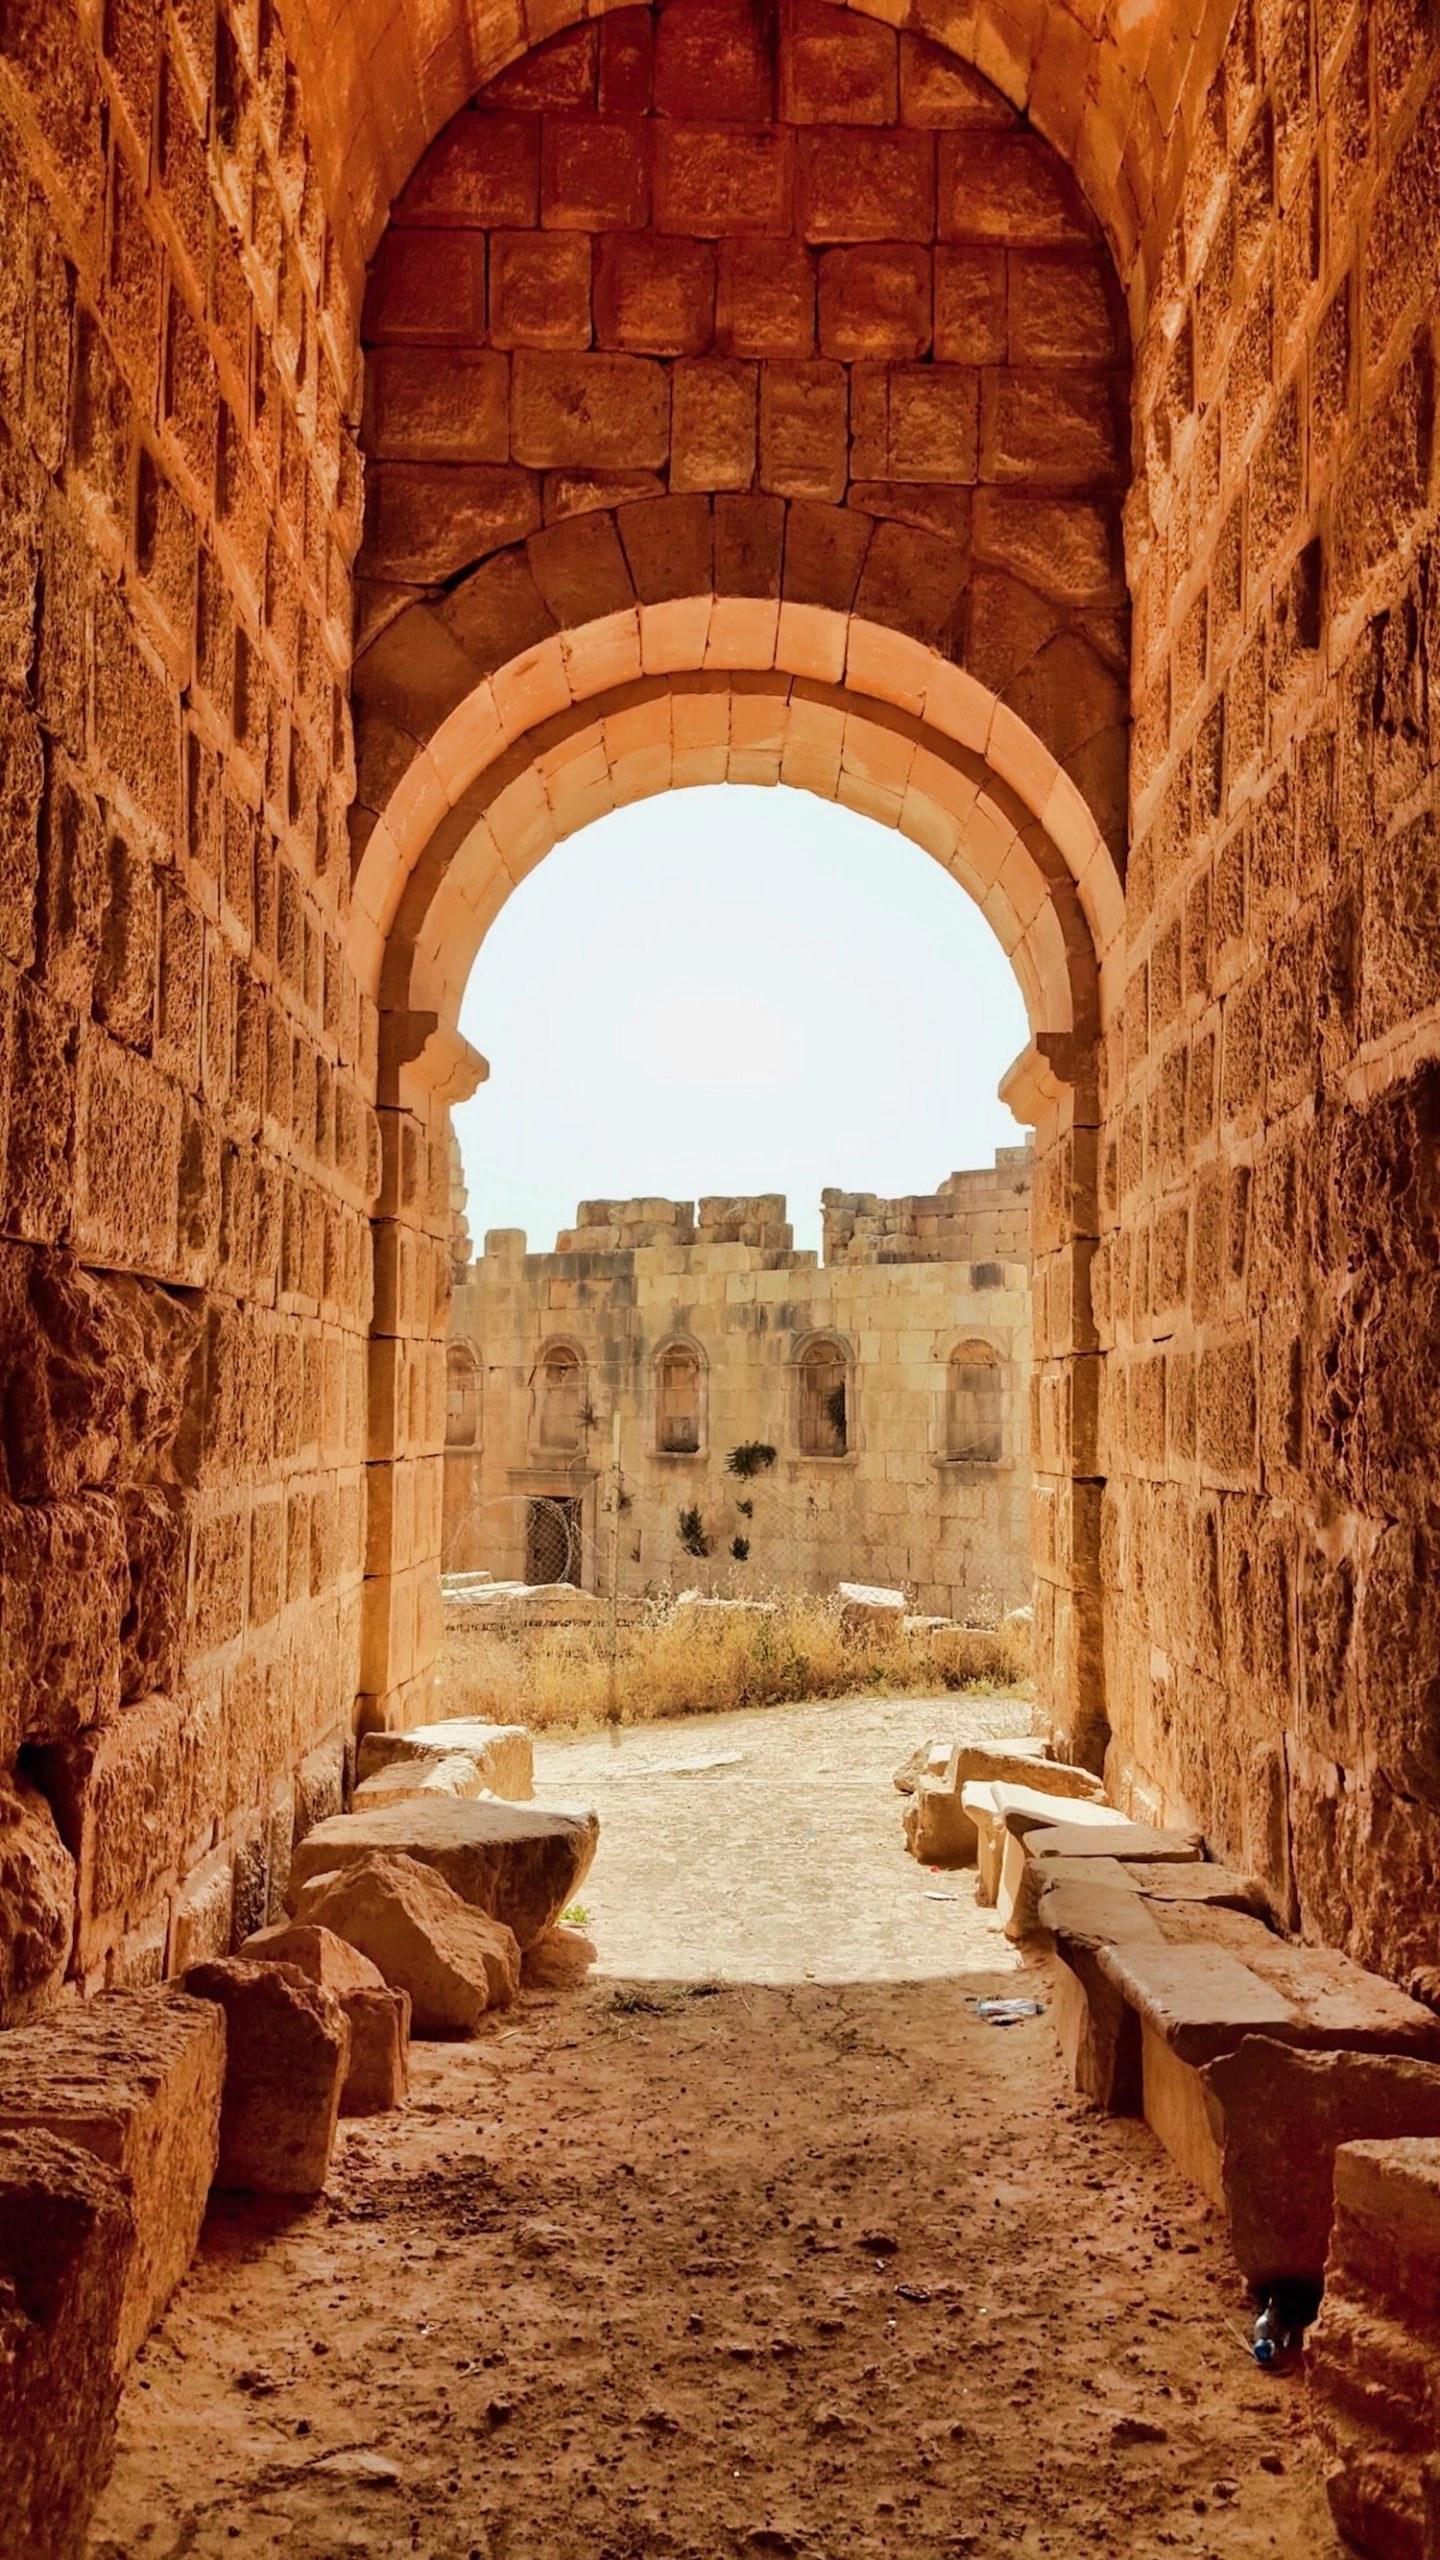 10 Days in Jordan - Jerash Doorway